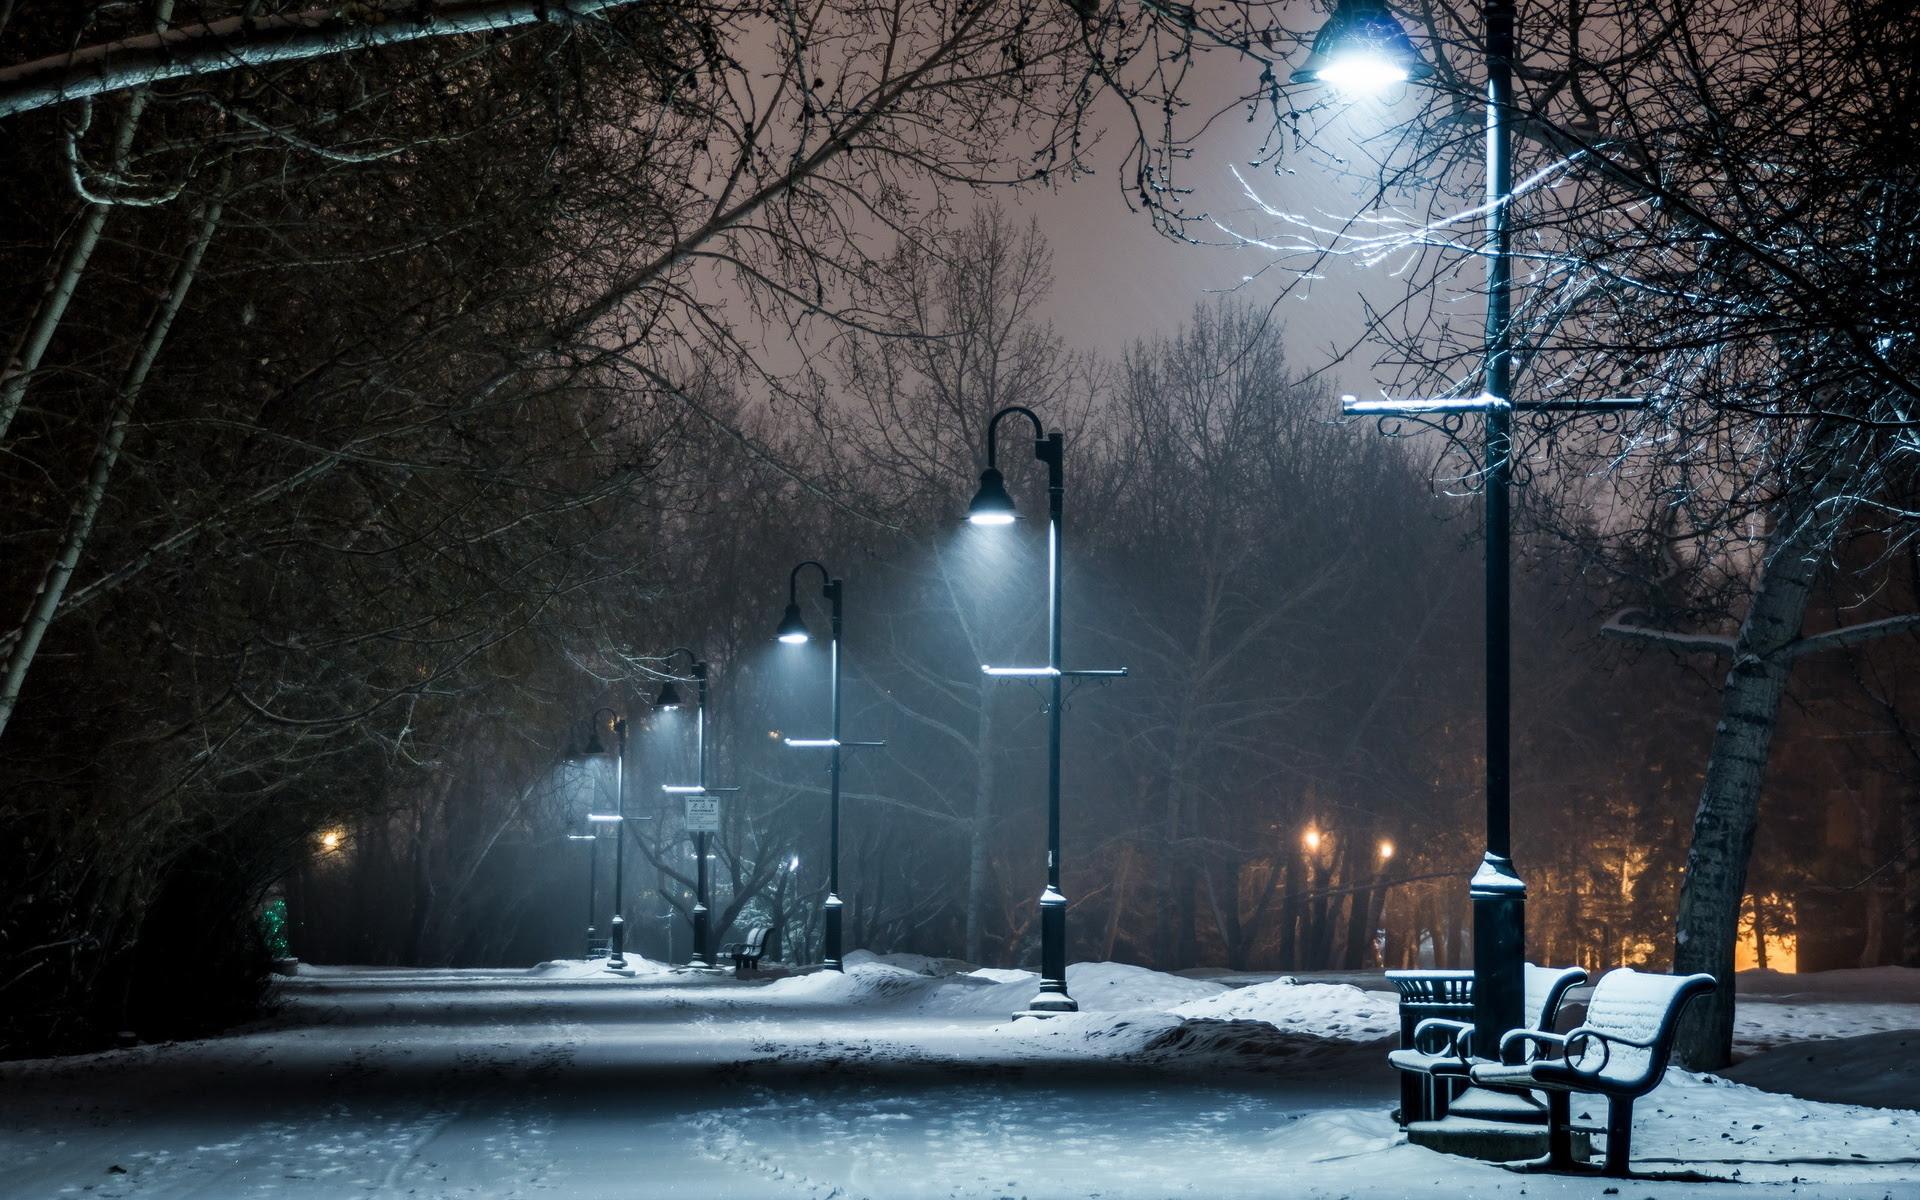 Winter Snow Bench Lights Wallpaper 1920x1200 22105